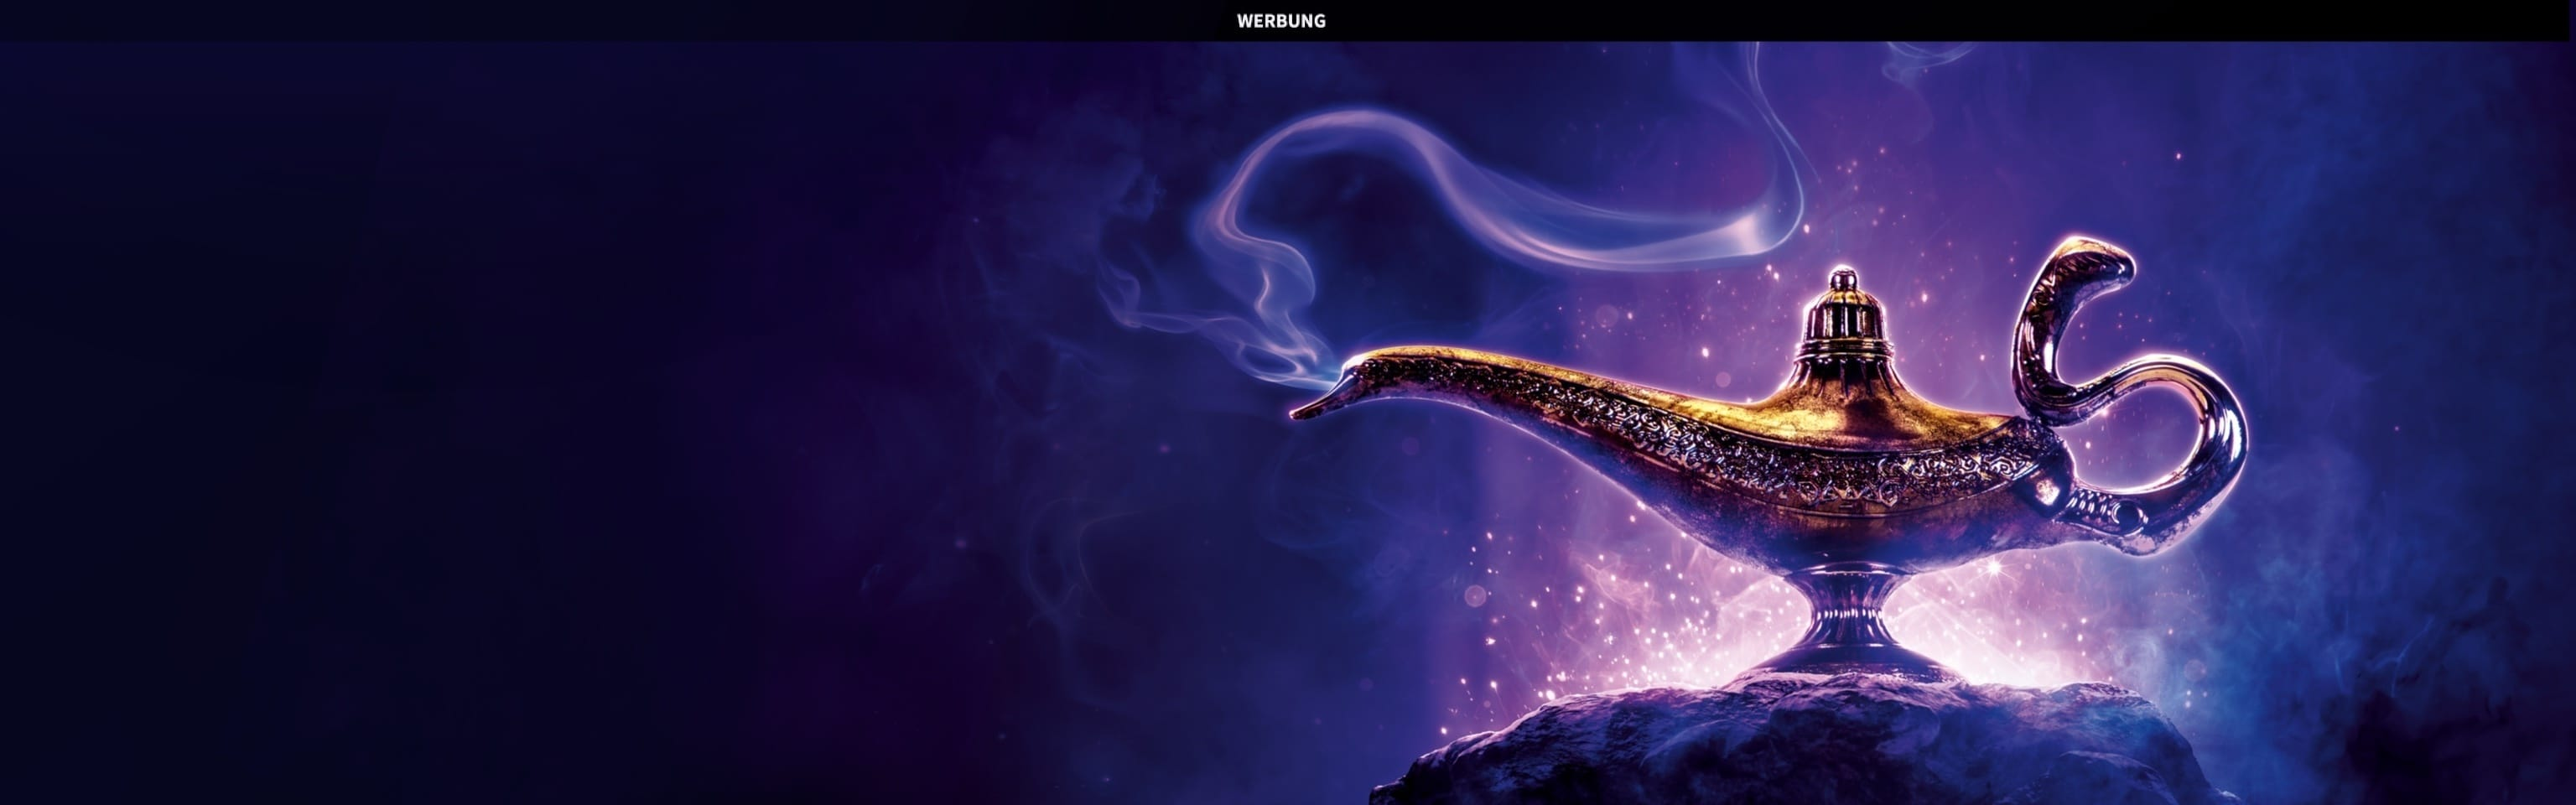 Aladdin Gewinnspiel (Hero)